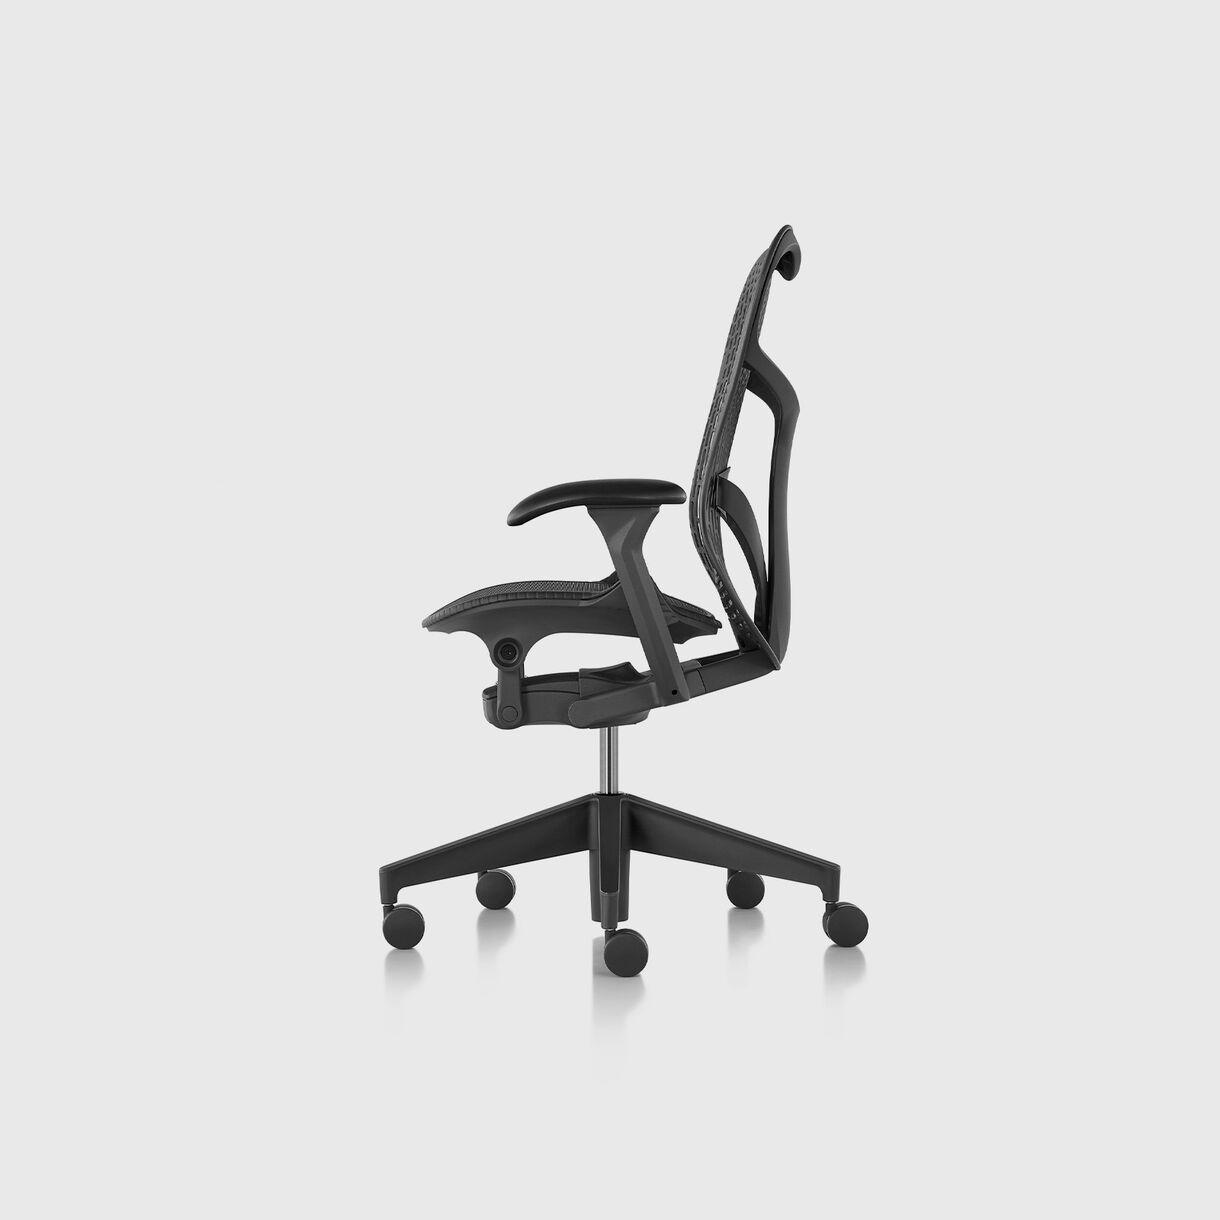 Mirra 2 Work Chair - TriFlex Graphite, Graphite Base & Frame - Fully Adjustable Arms